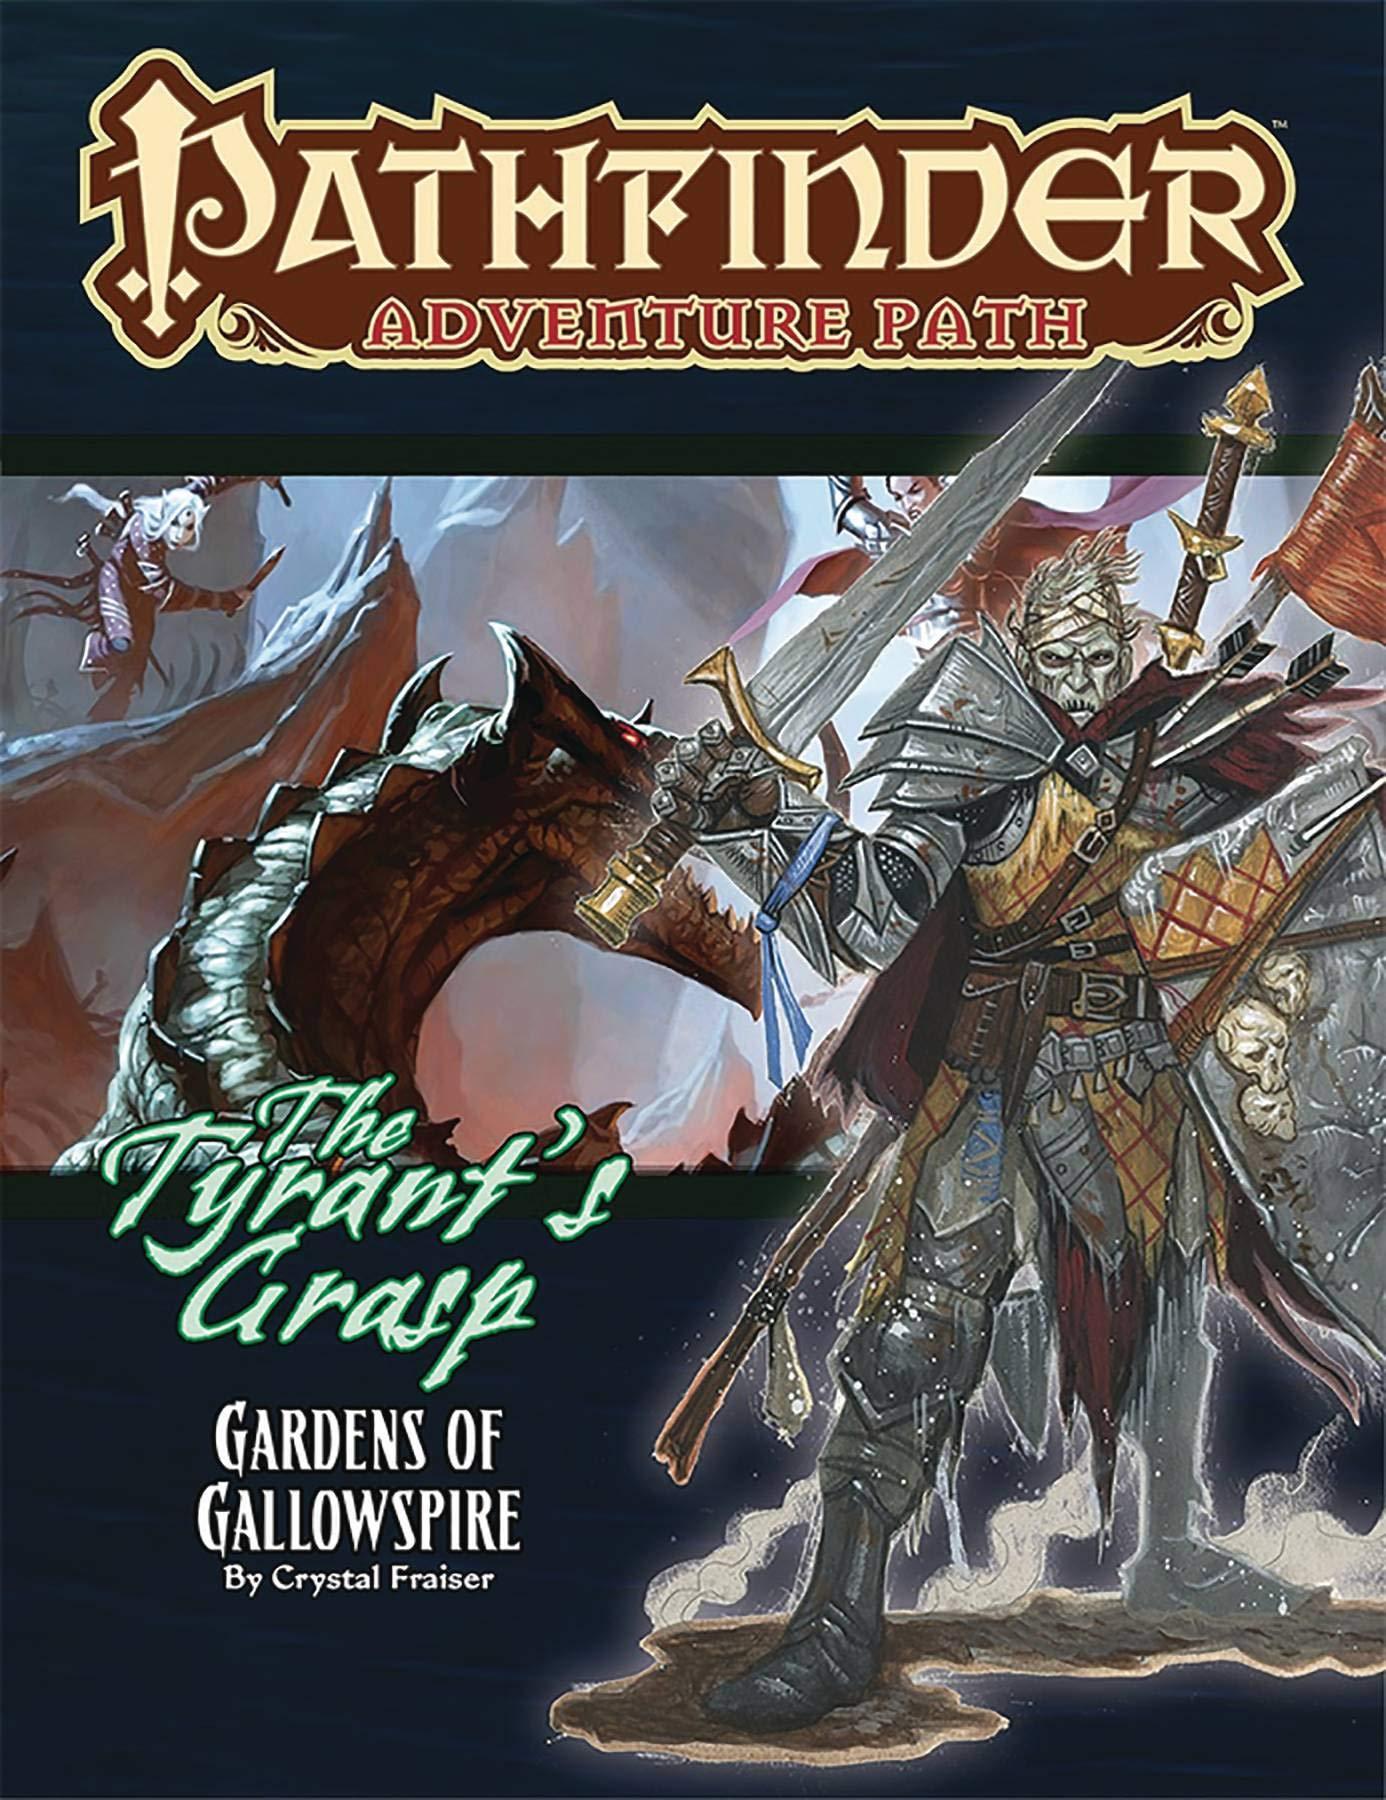 Pathfinder Adventure Path: Gardens of Gallowspire (Tyrant's